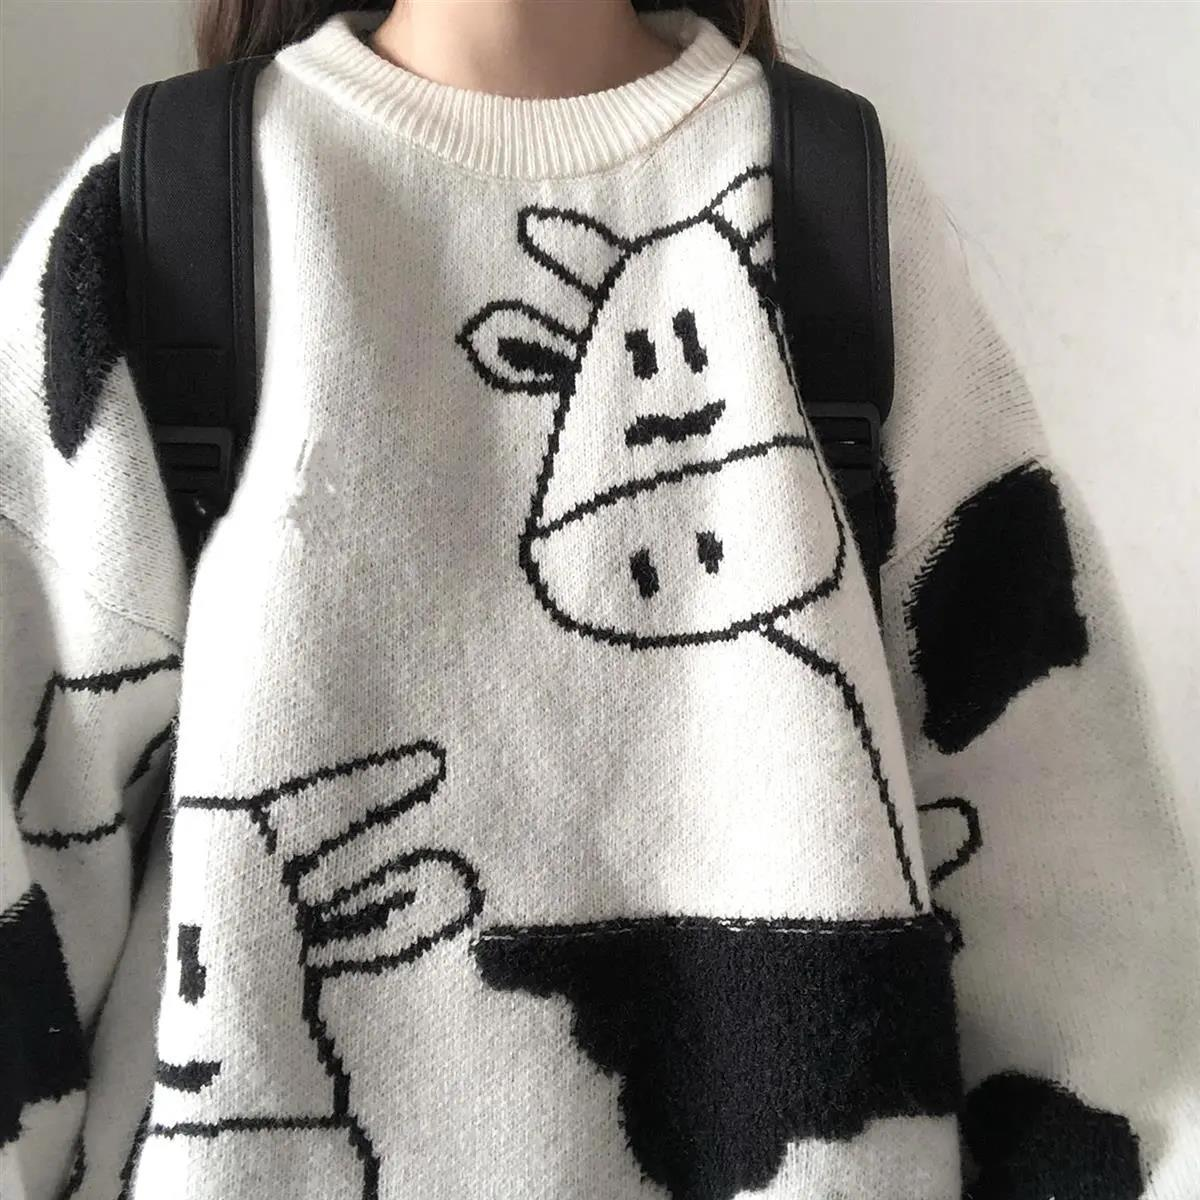 Egirl Harajuku pullover with a cow print 44